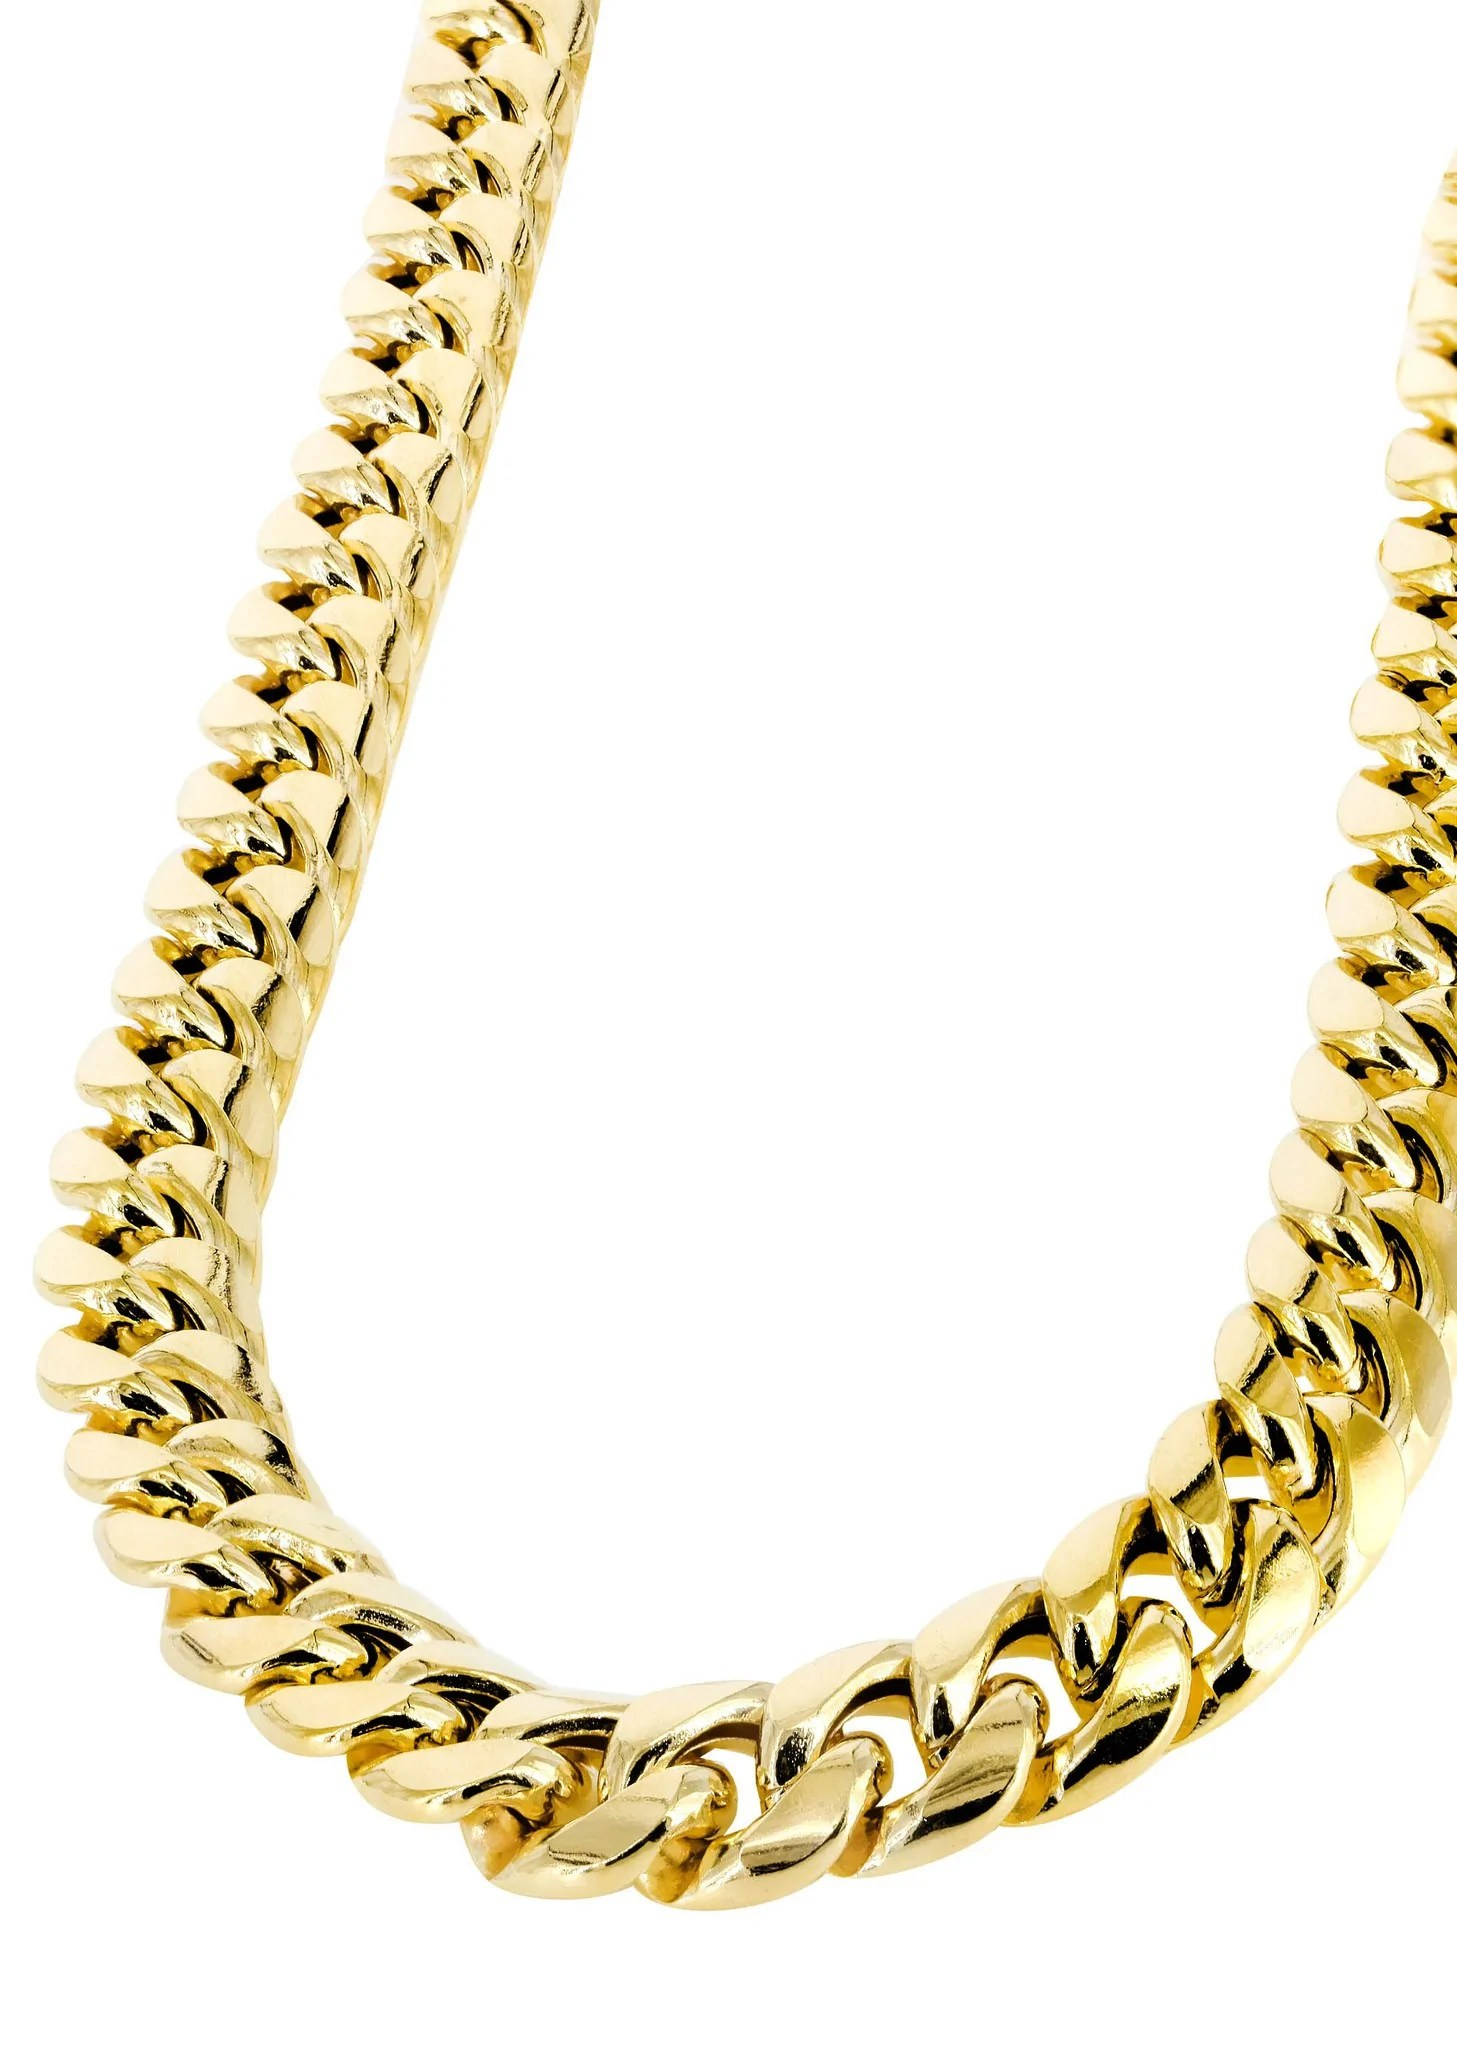 Gold Chain - Mens Hollow Miami Cuban Link 10k